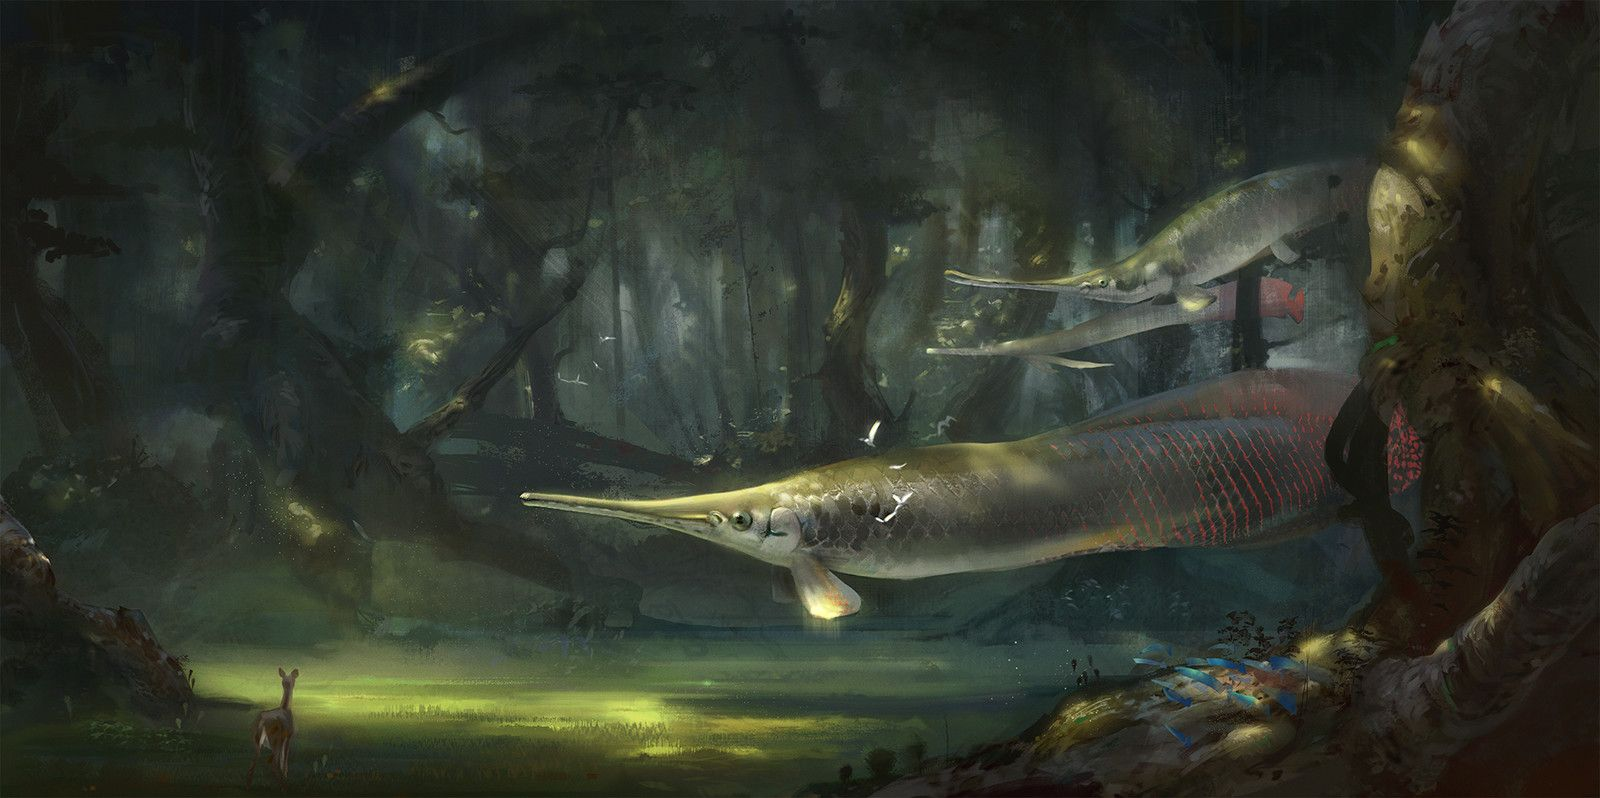 Forest of flying fishes, Marcin Basta on ArtStation at https://www.artstation.com/artwork/forest-of-flying-fishes